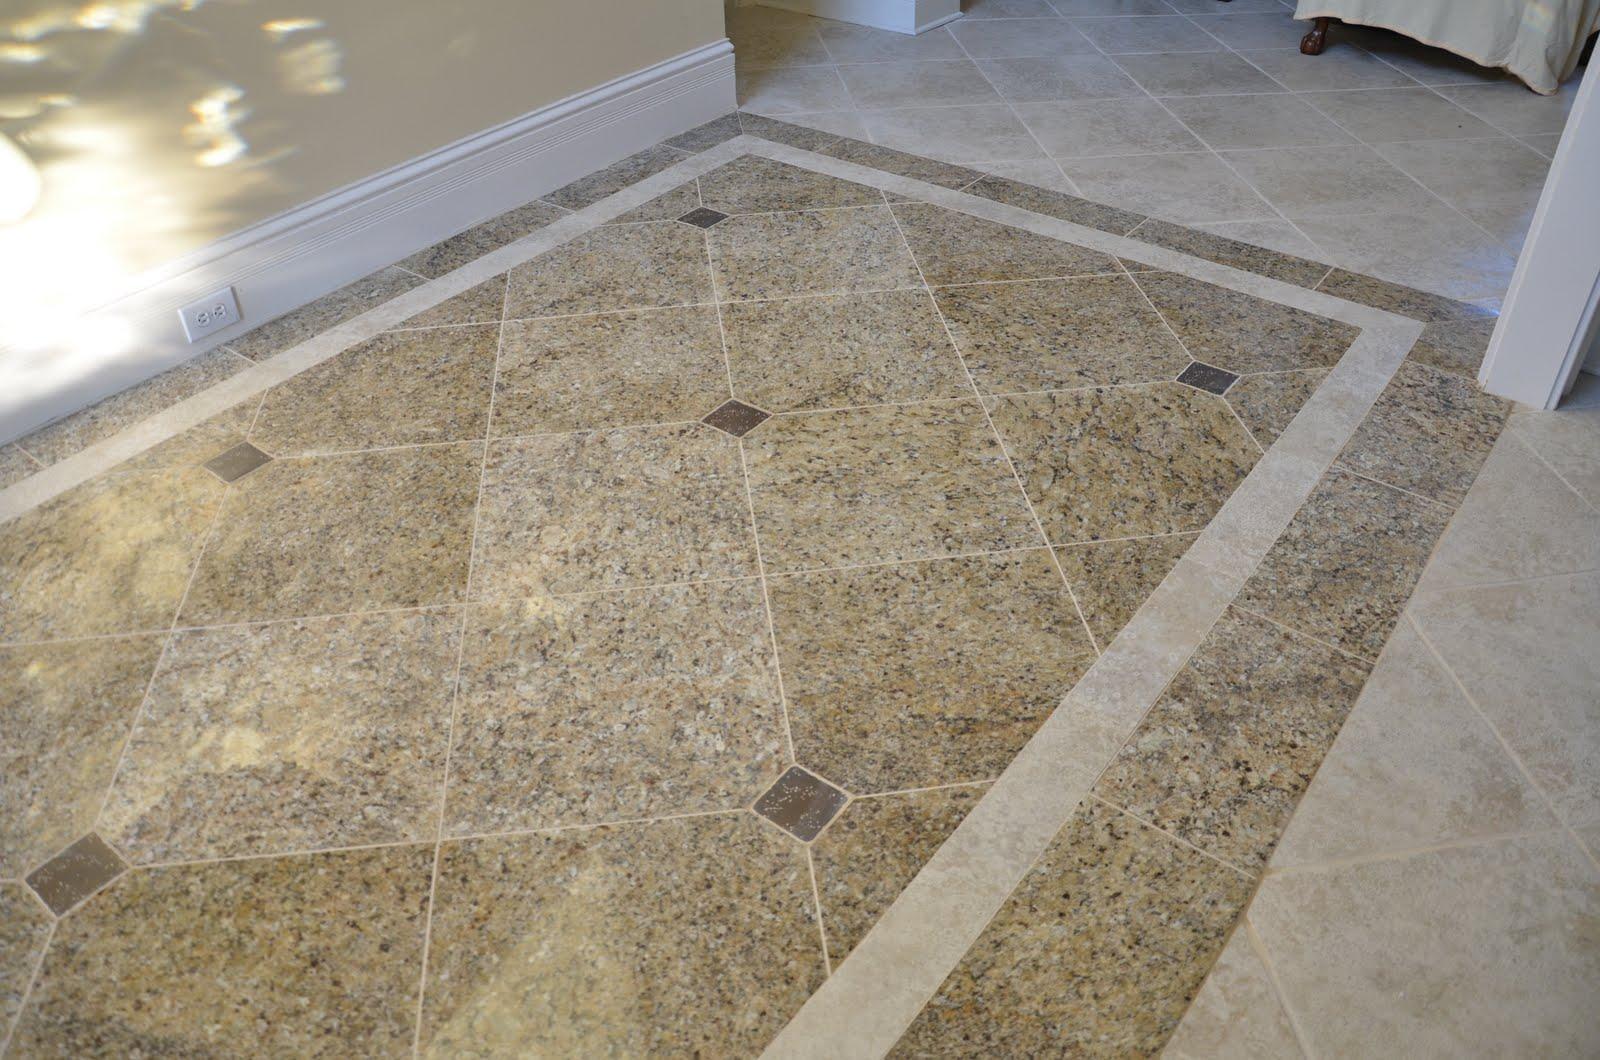 Foyer Tile Design Ideas bathroom floor tile design of worthy images about floor tile on pinterest picture floor tile Contemporary Tile Foyer Designs